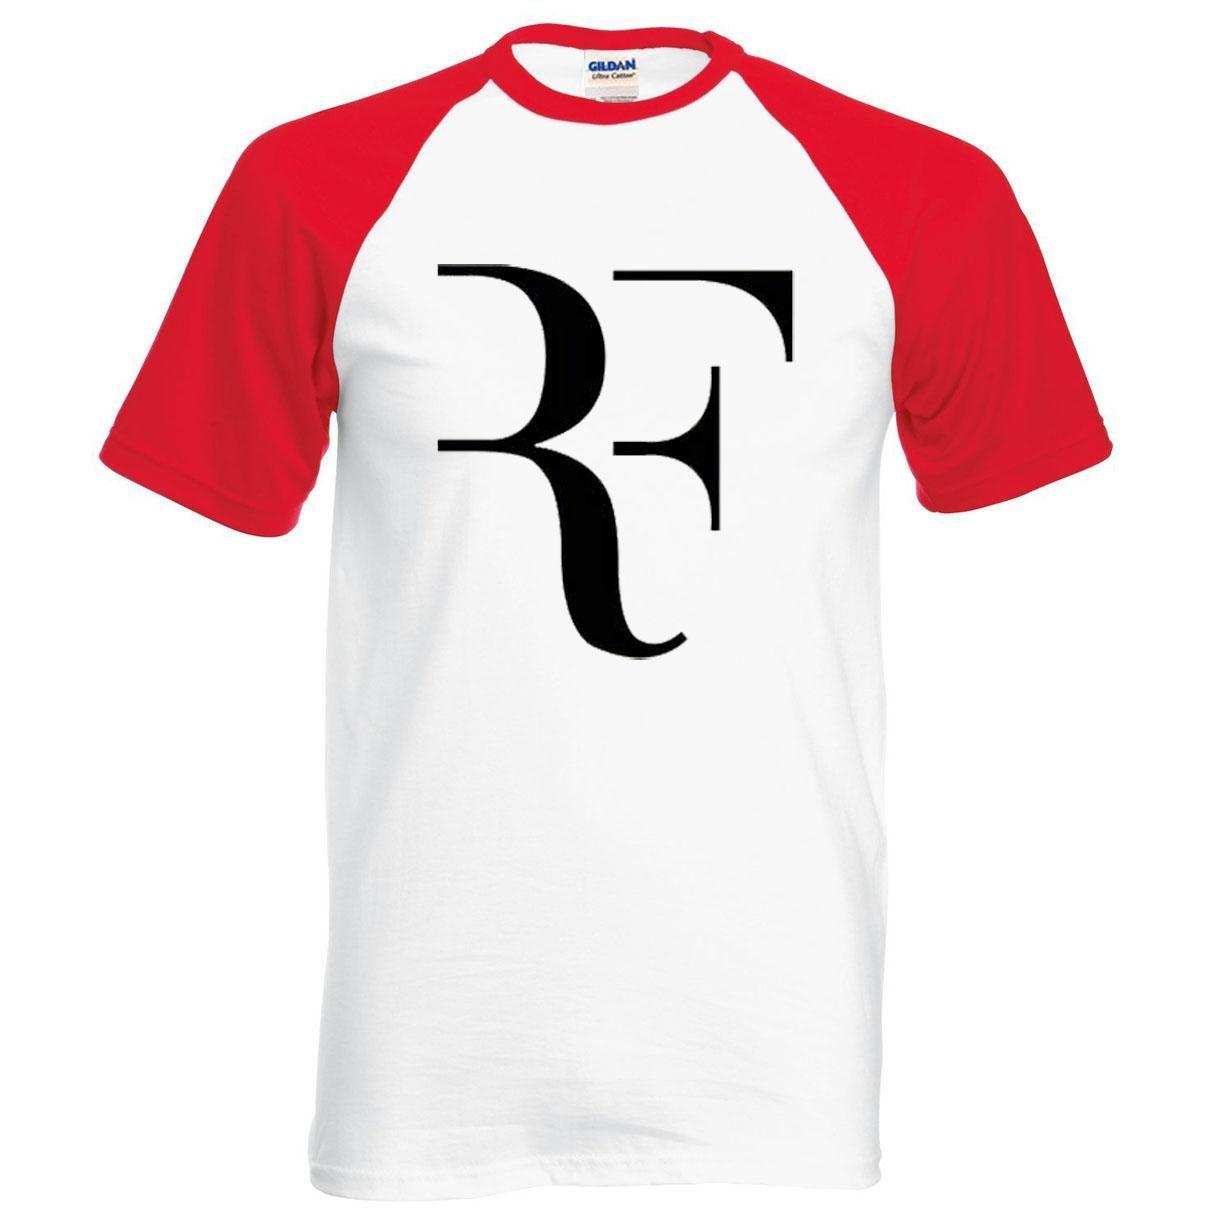 321049035d8f 2018 New Summer Roger Federer Men T Shirt Rf Raglan T Shirt Fashion 100%  Cotton Hip Hop Loose T Shirt Tops Tees Brand Clothing Make Your Own T  Shirts T ...